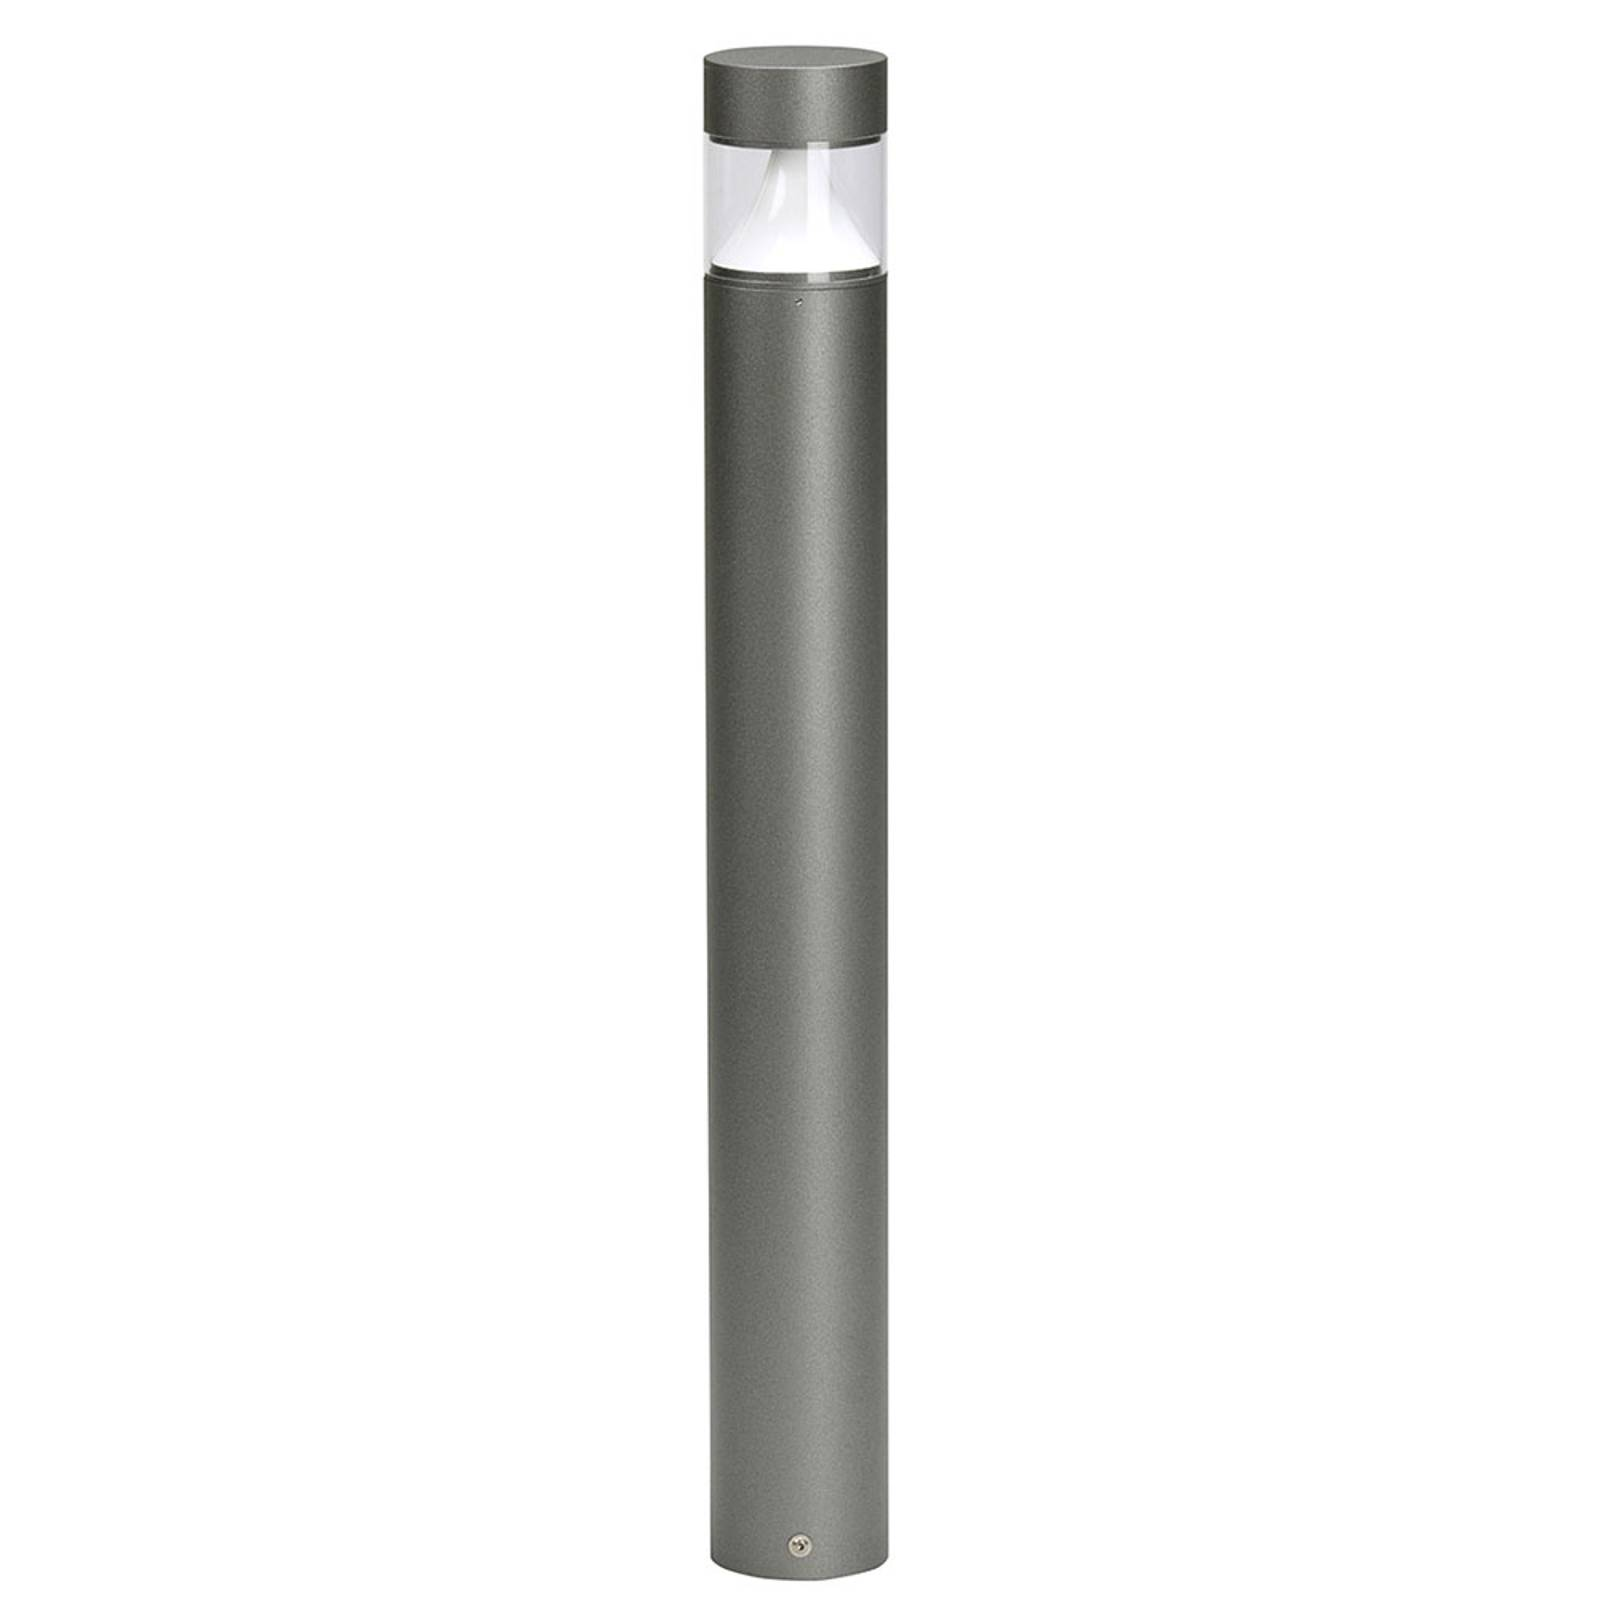 LED-Wegeleuchte 2295, anthrazit/klar